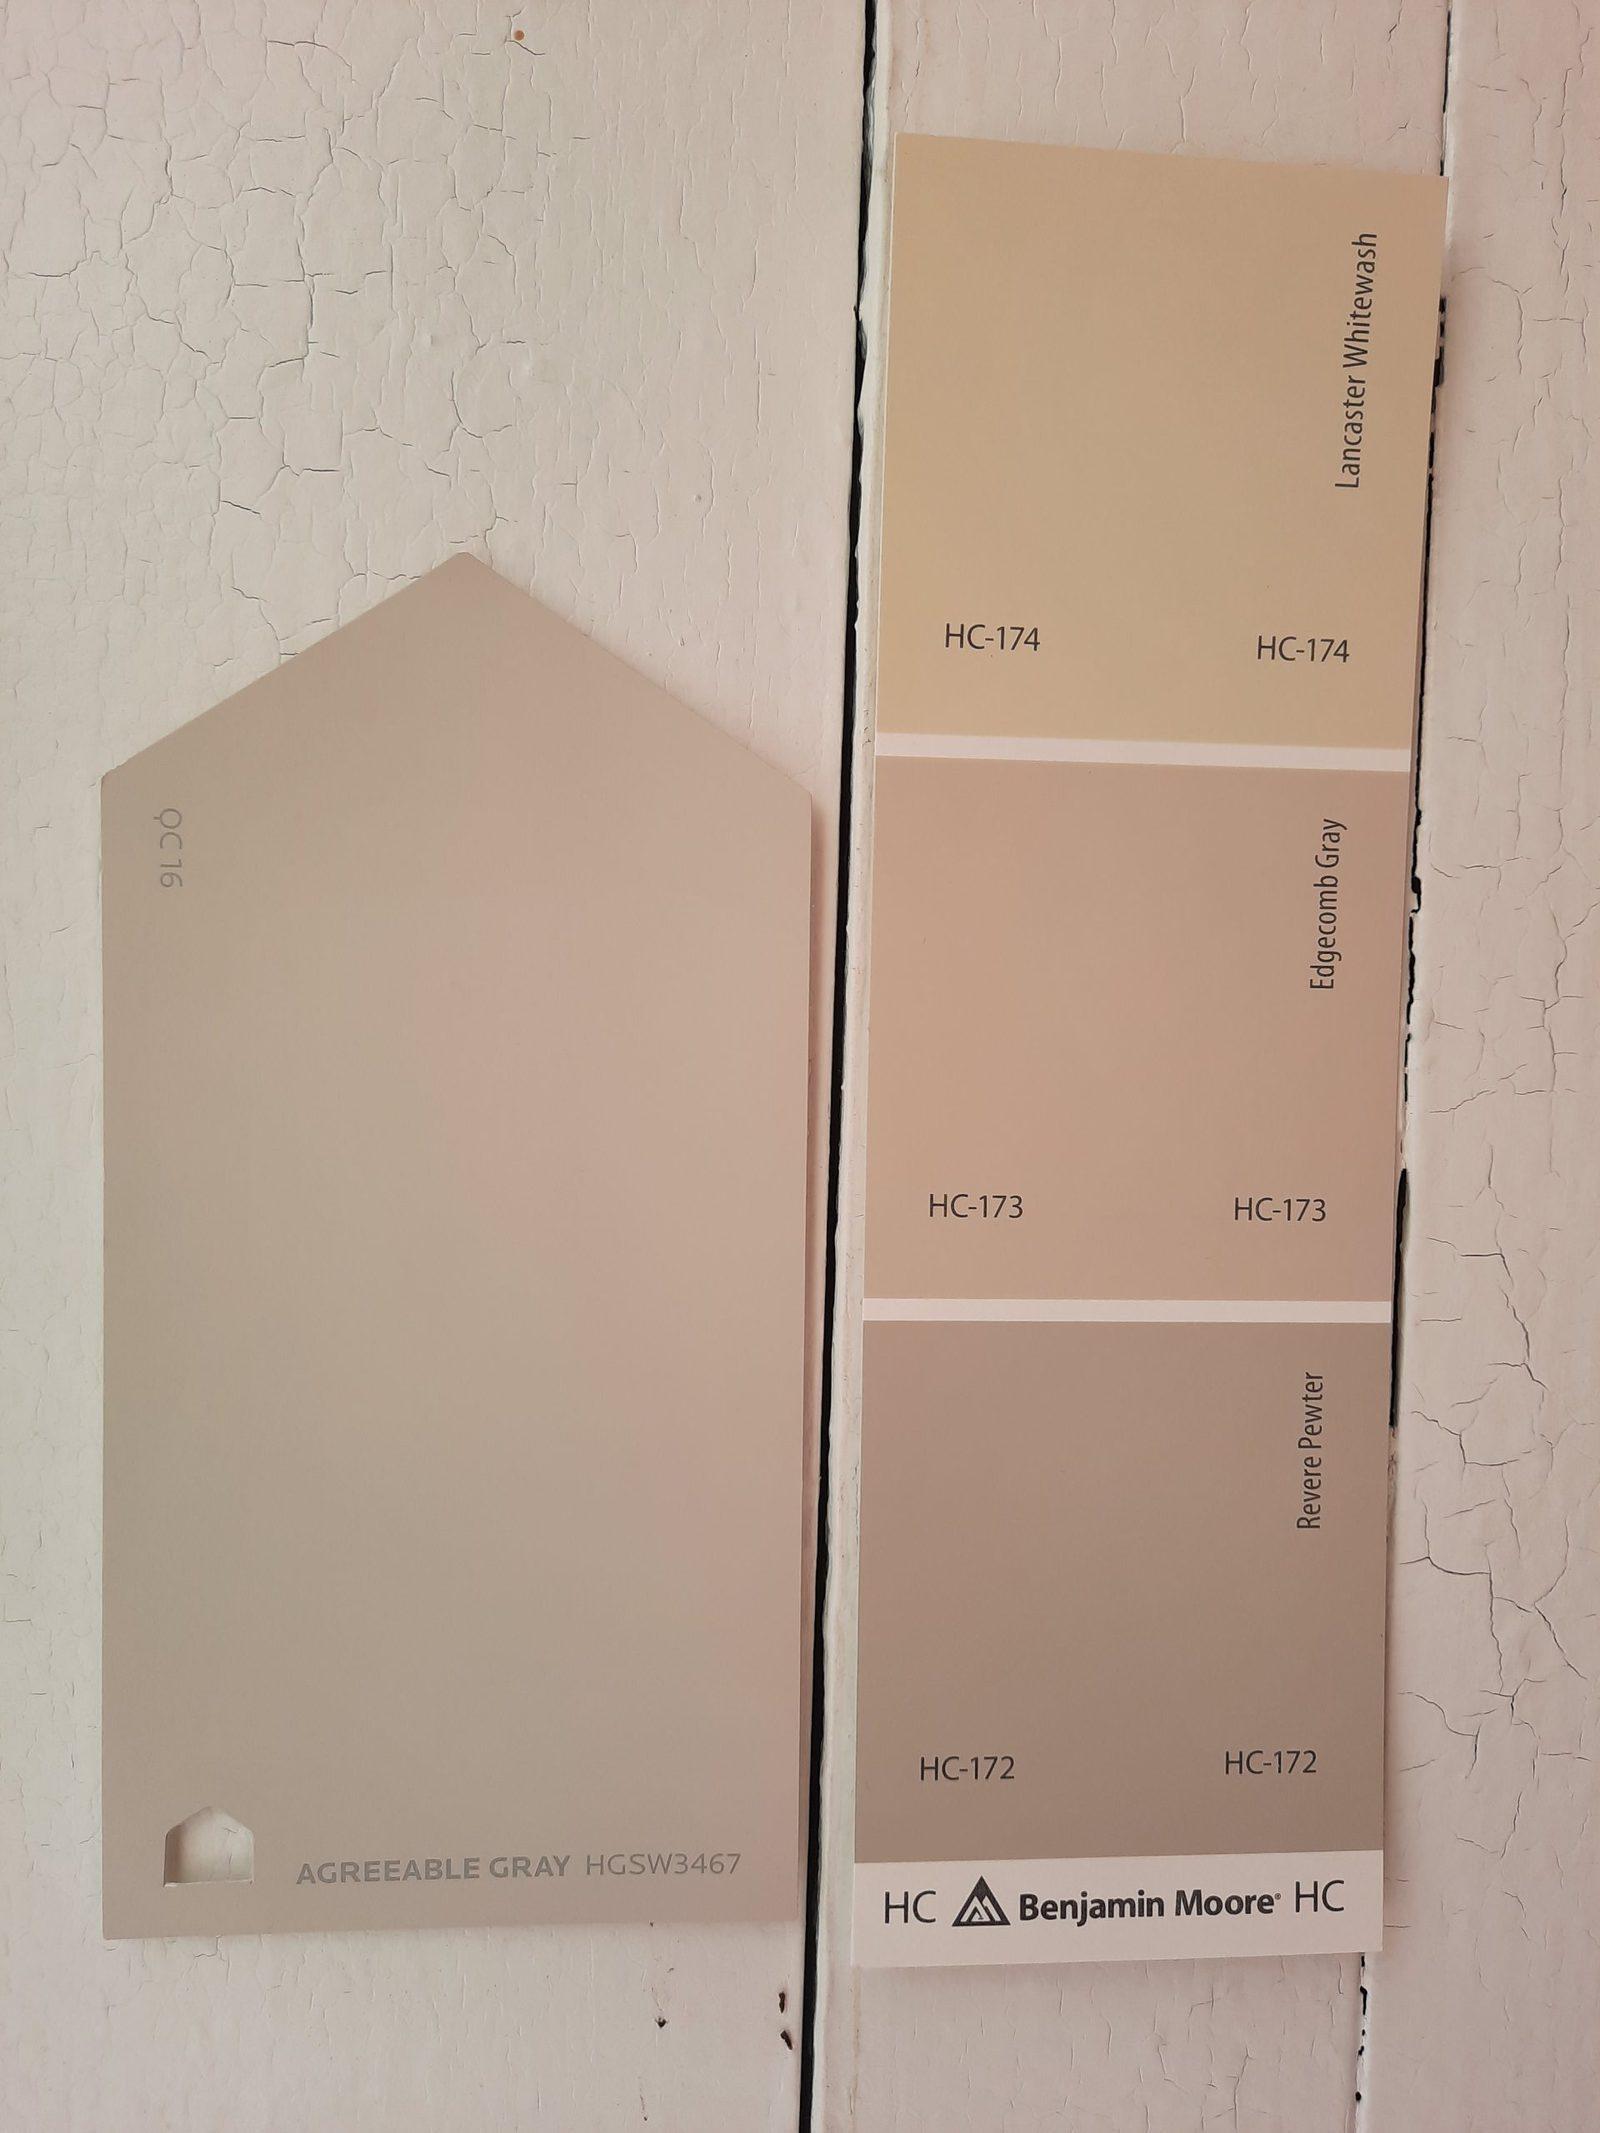 8 Agreeable Gray vs Edgecomb Gray scaled